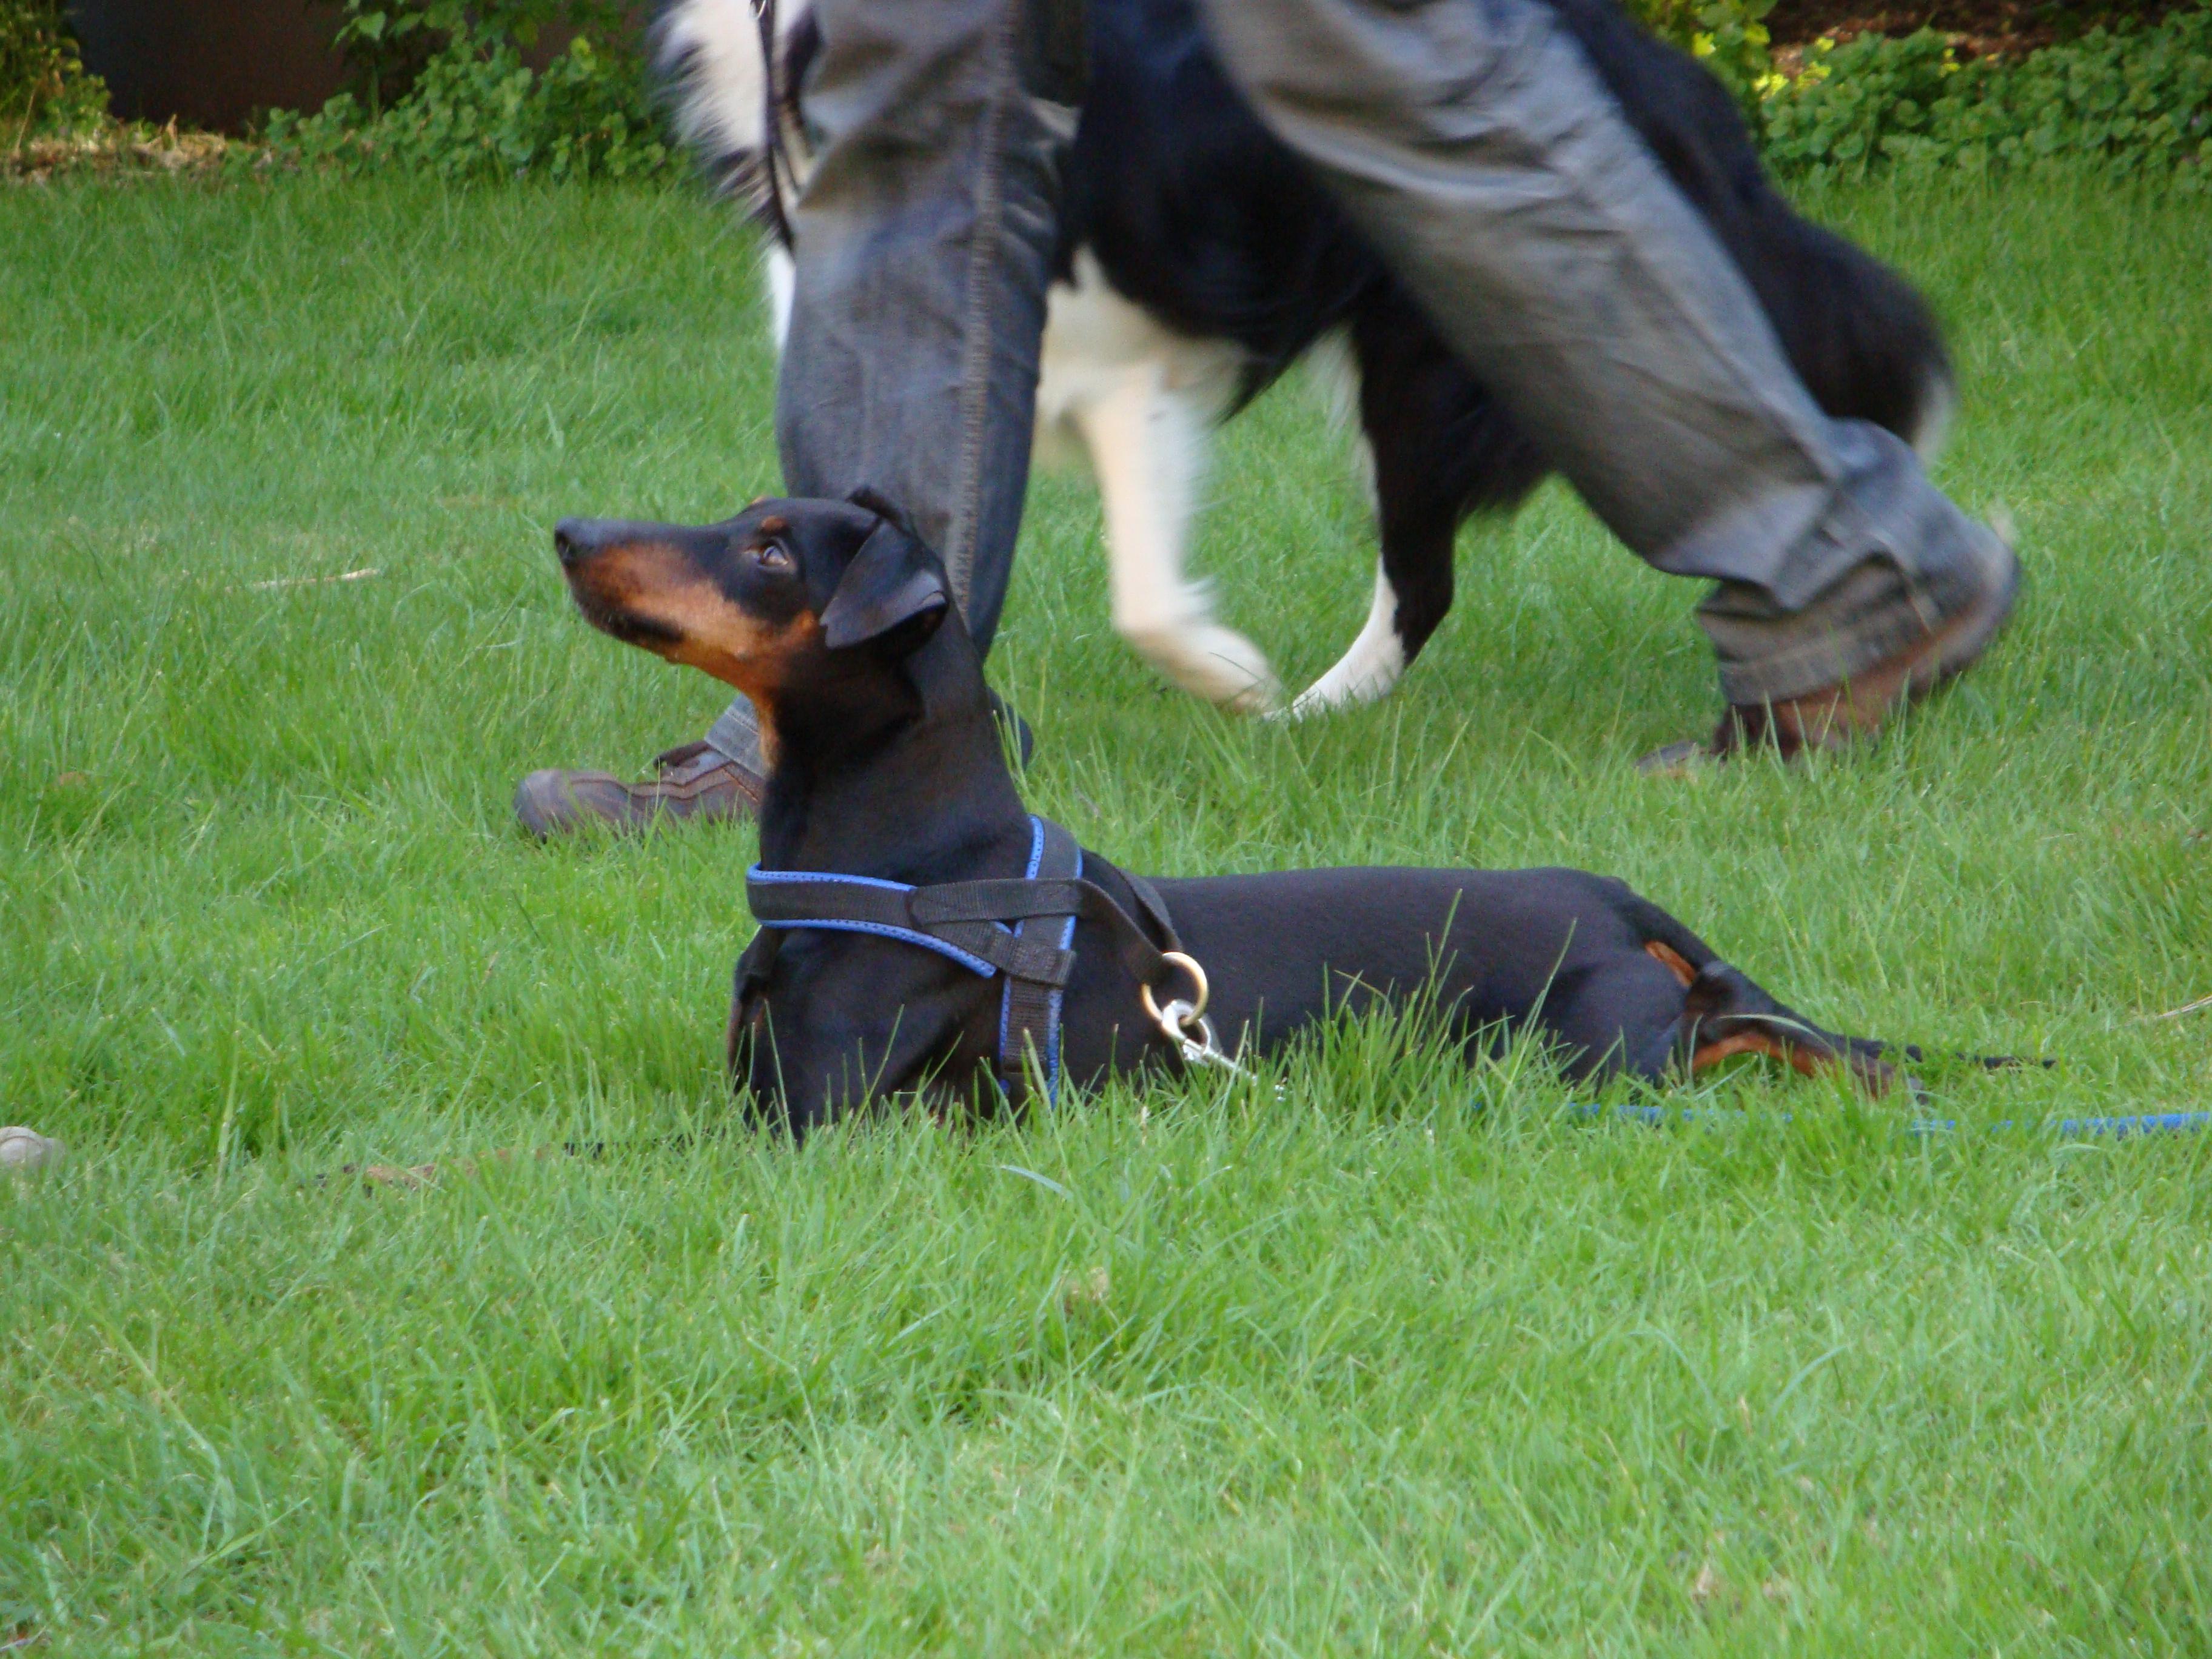 basis erziehung eines hundes